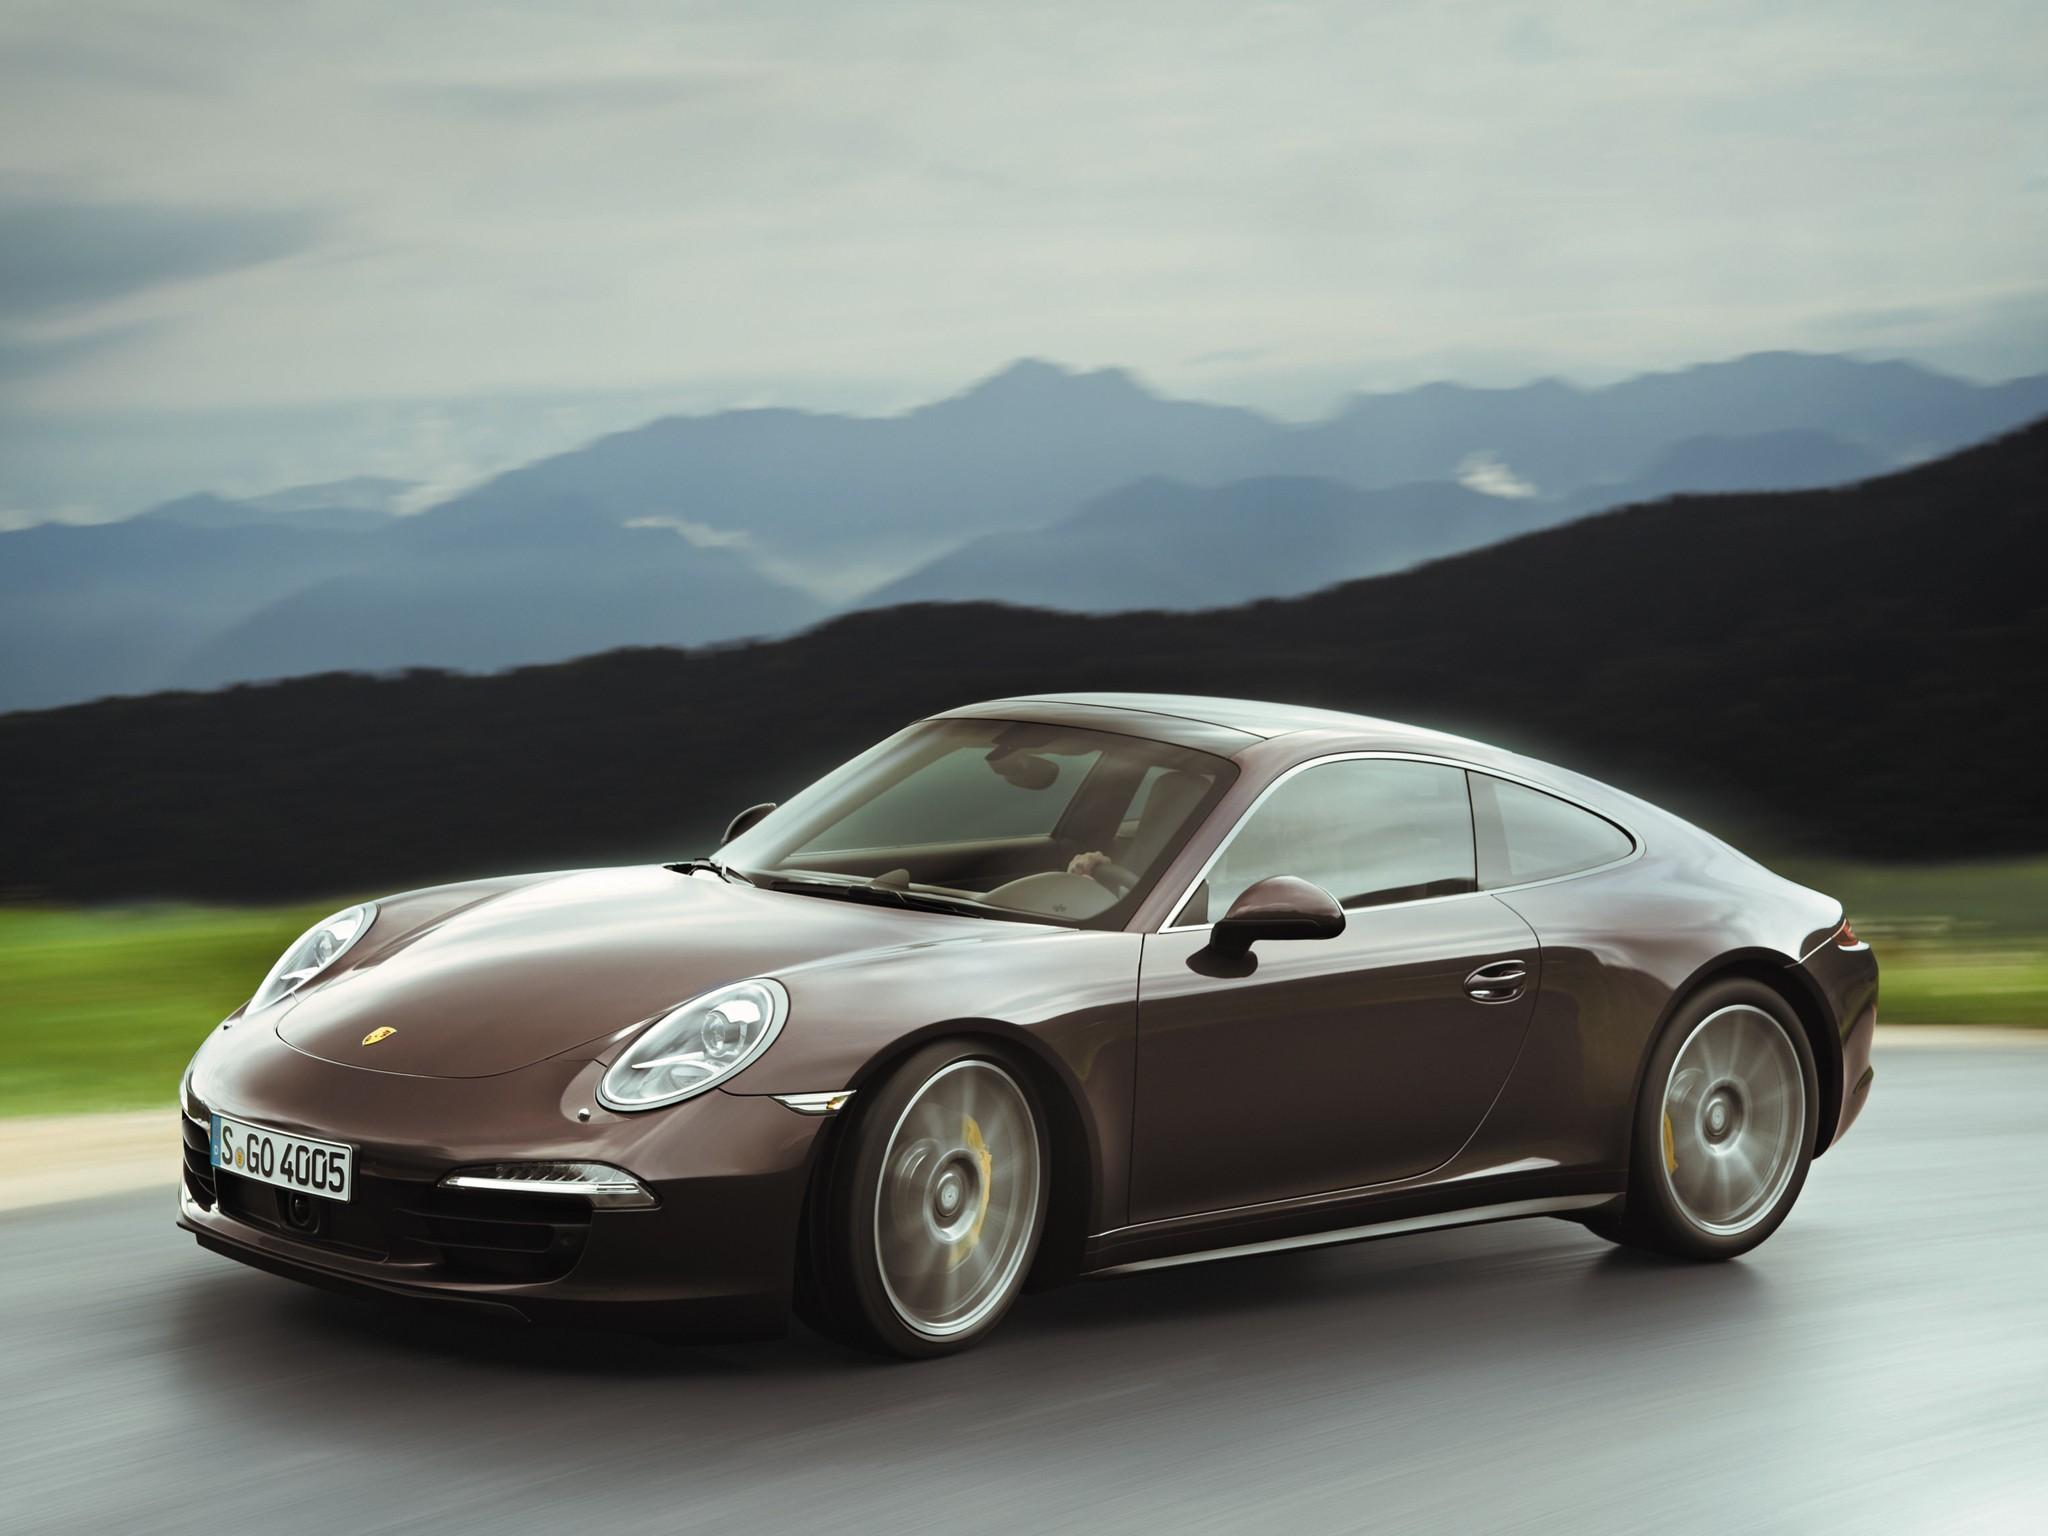 porsche 911 carrera 4s 991 2012 2013 2014 2015 2016 2017 autoevolution. Black Bedroom Furniture Sets. Home Design Ideas